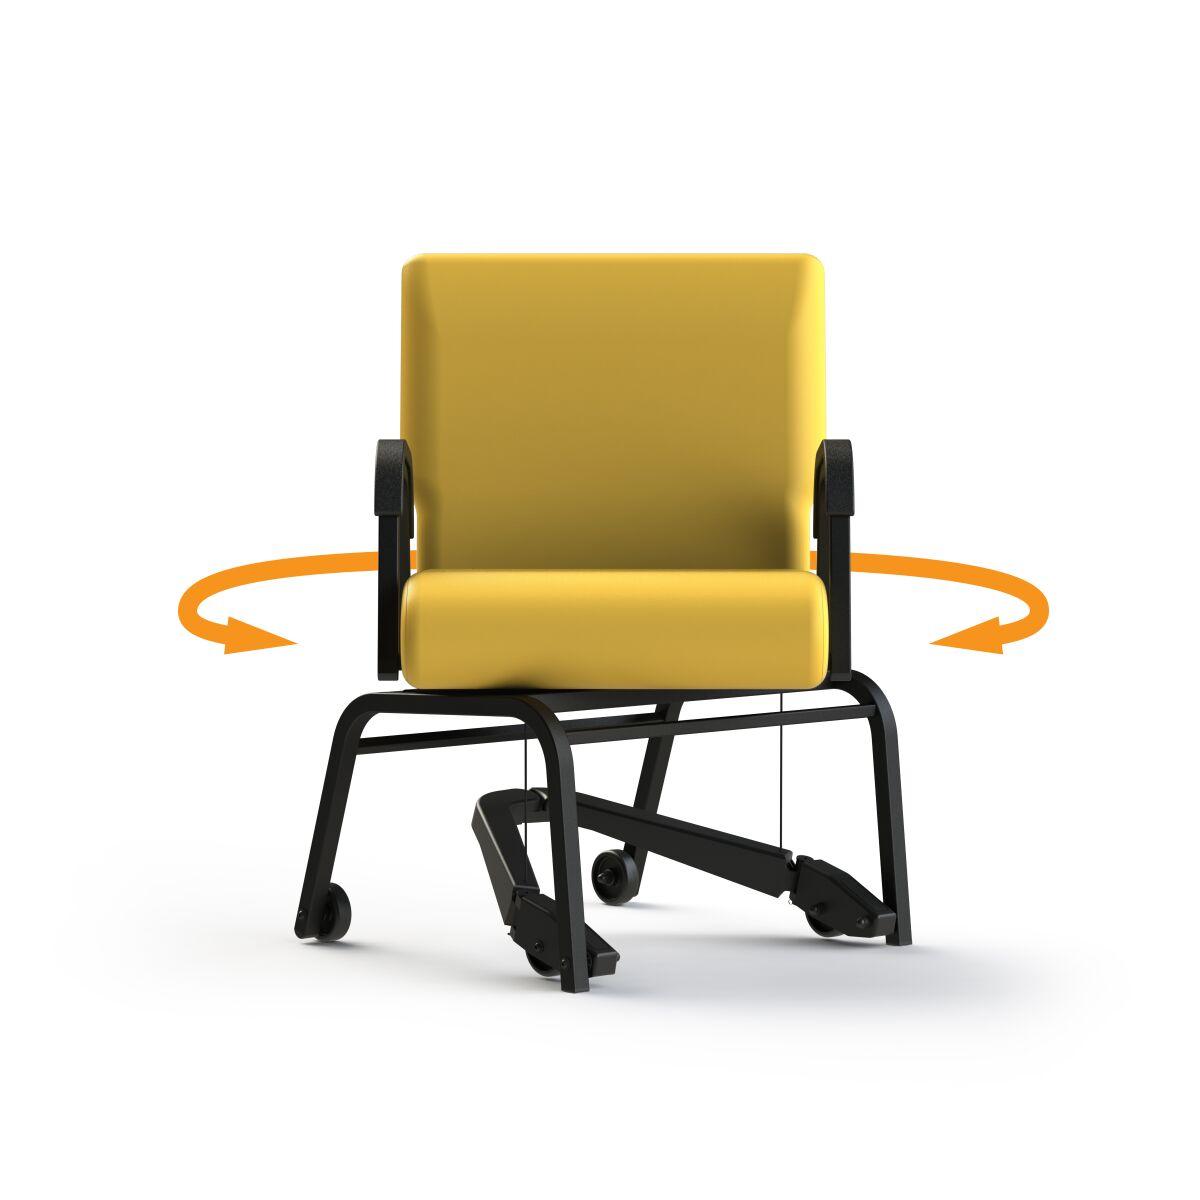 Marvelous Comfortek Titan Swivel Chair W Rez Mobility Assist Lever 22 Seat 300Lbs Kitchen Dining Desk Lemon Ibusinesslaw Wood Chair Design Ideas Ibusinesslaworg